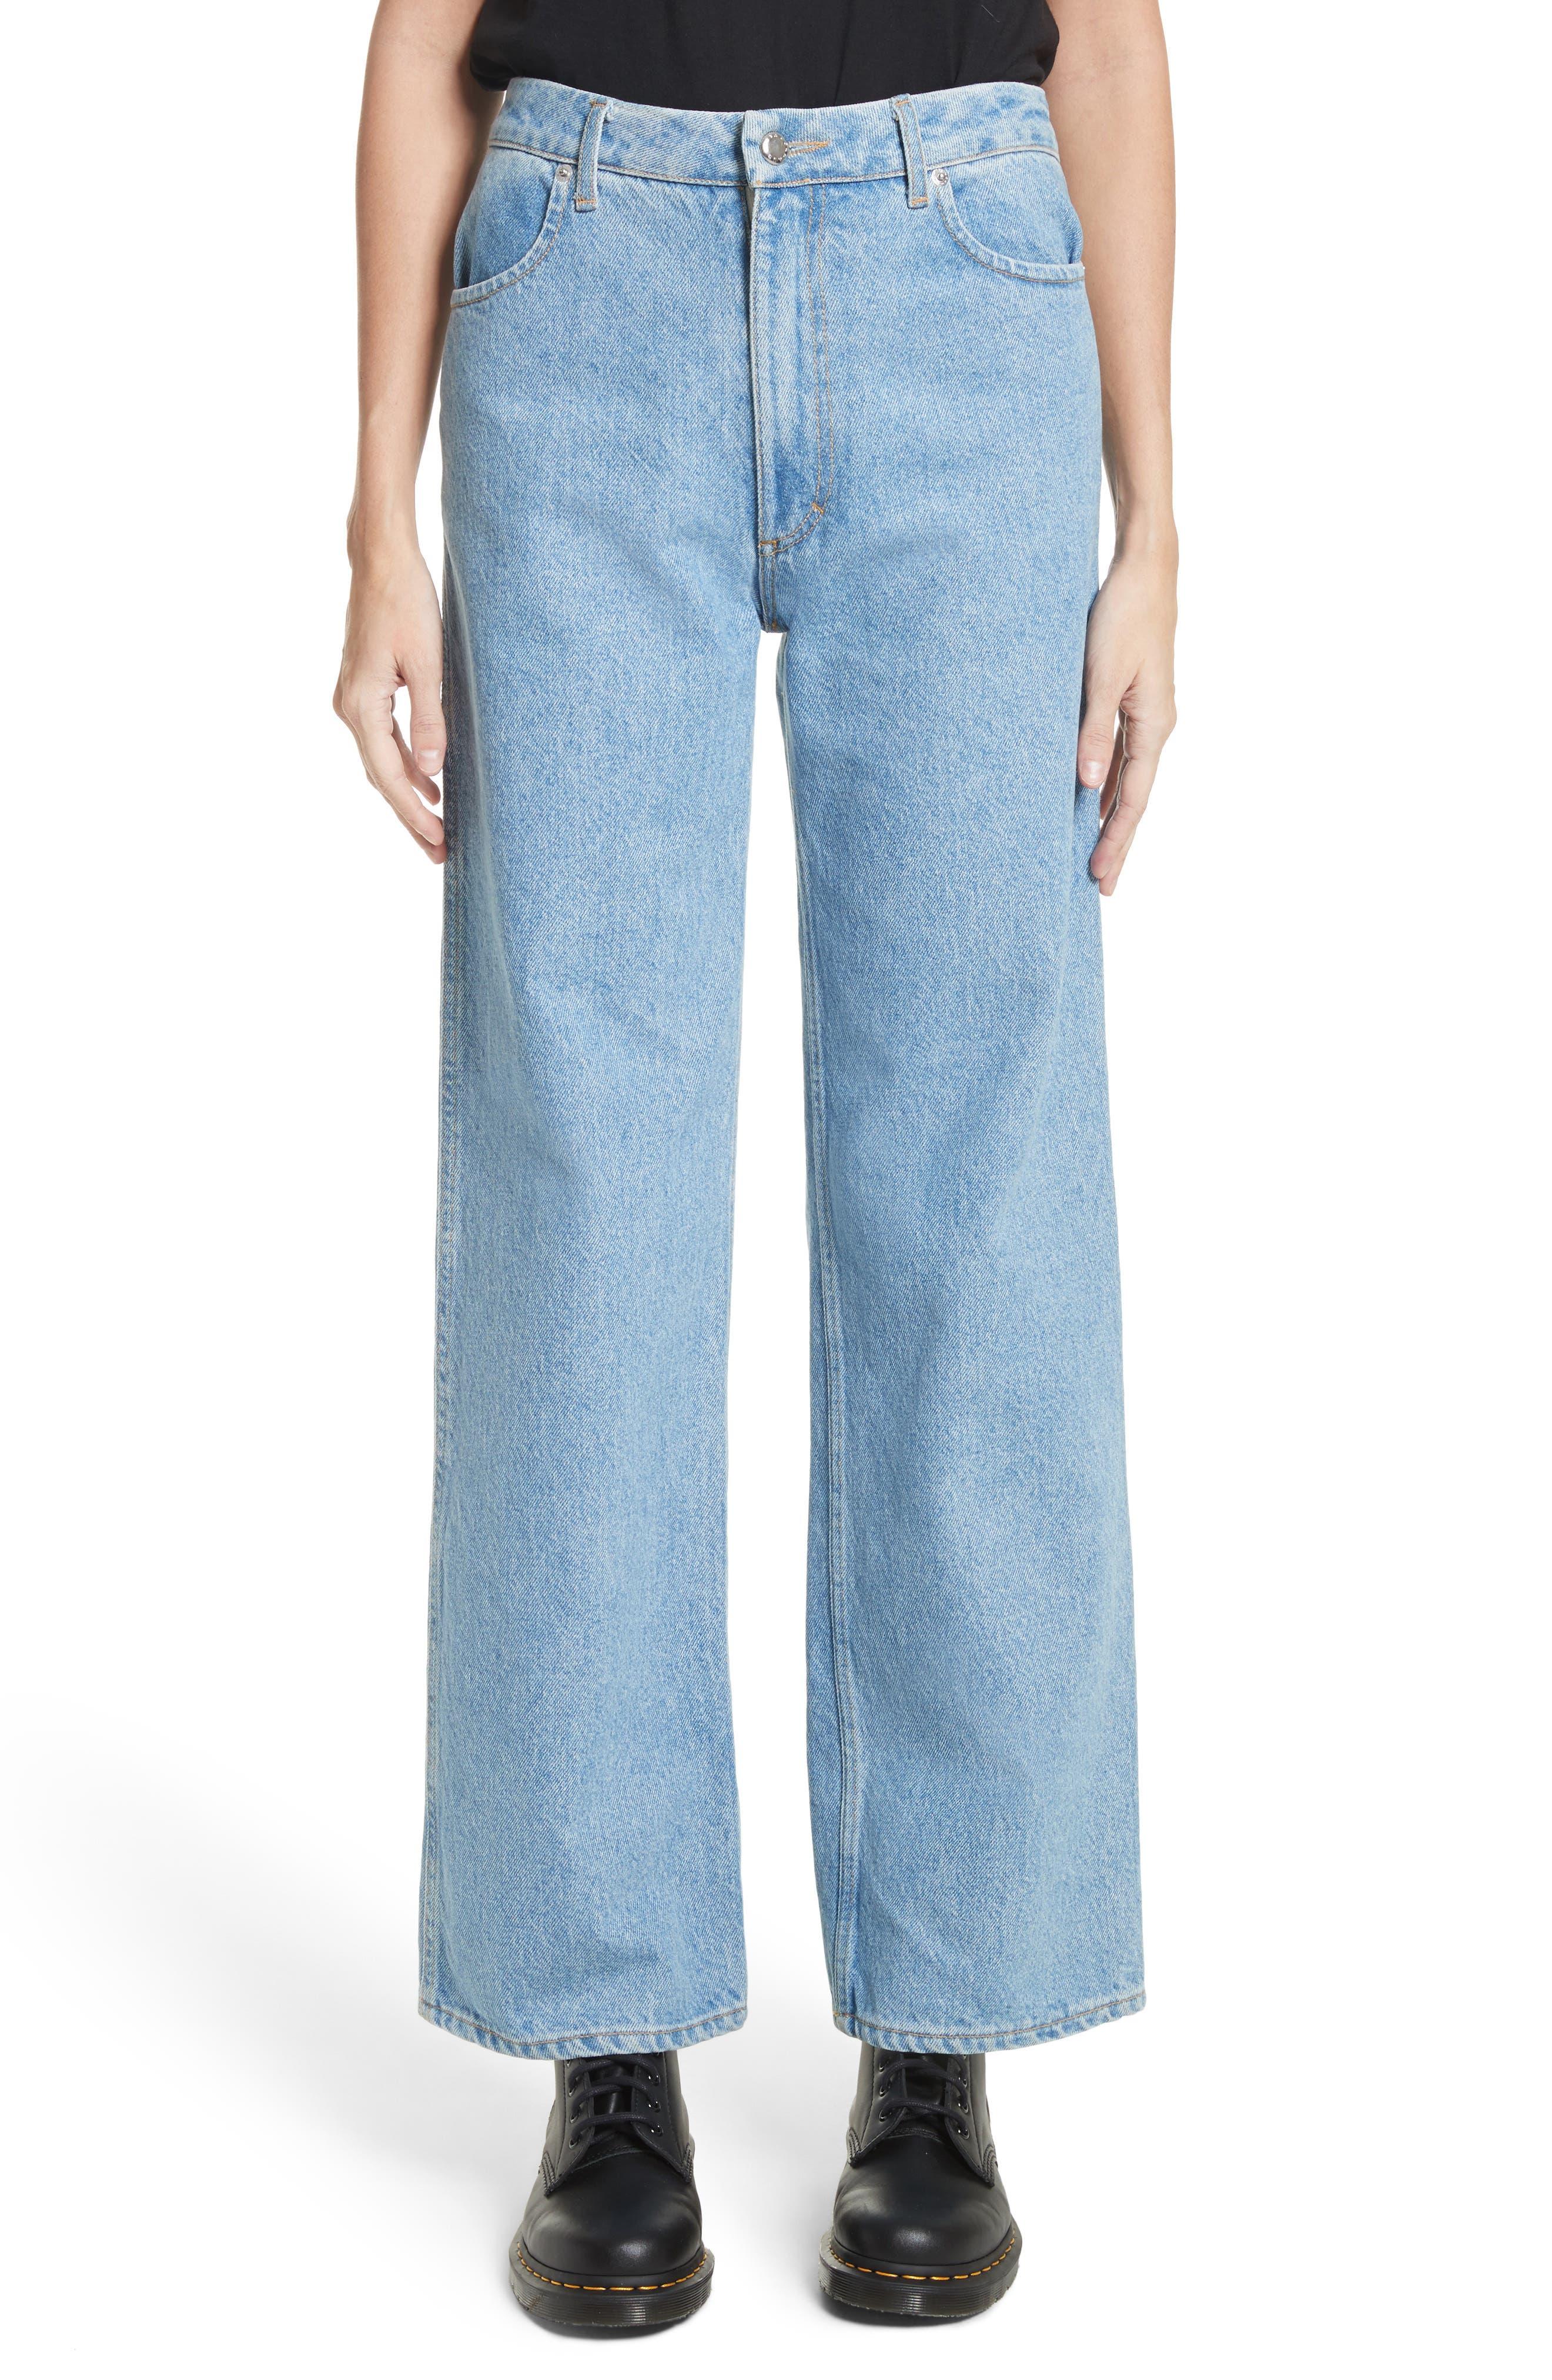 EL Wide Leg Jeans,                             Main thumbnail 1, color,                             True Blue